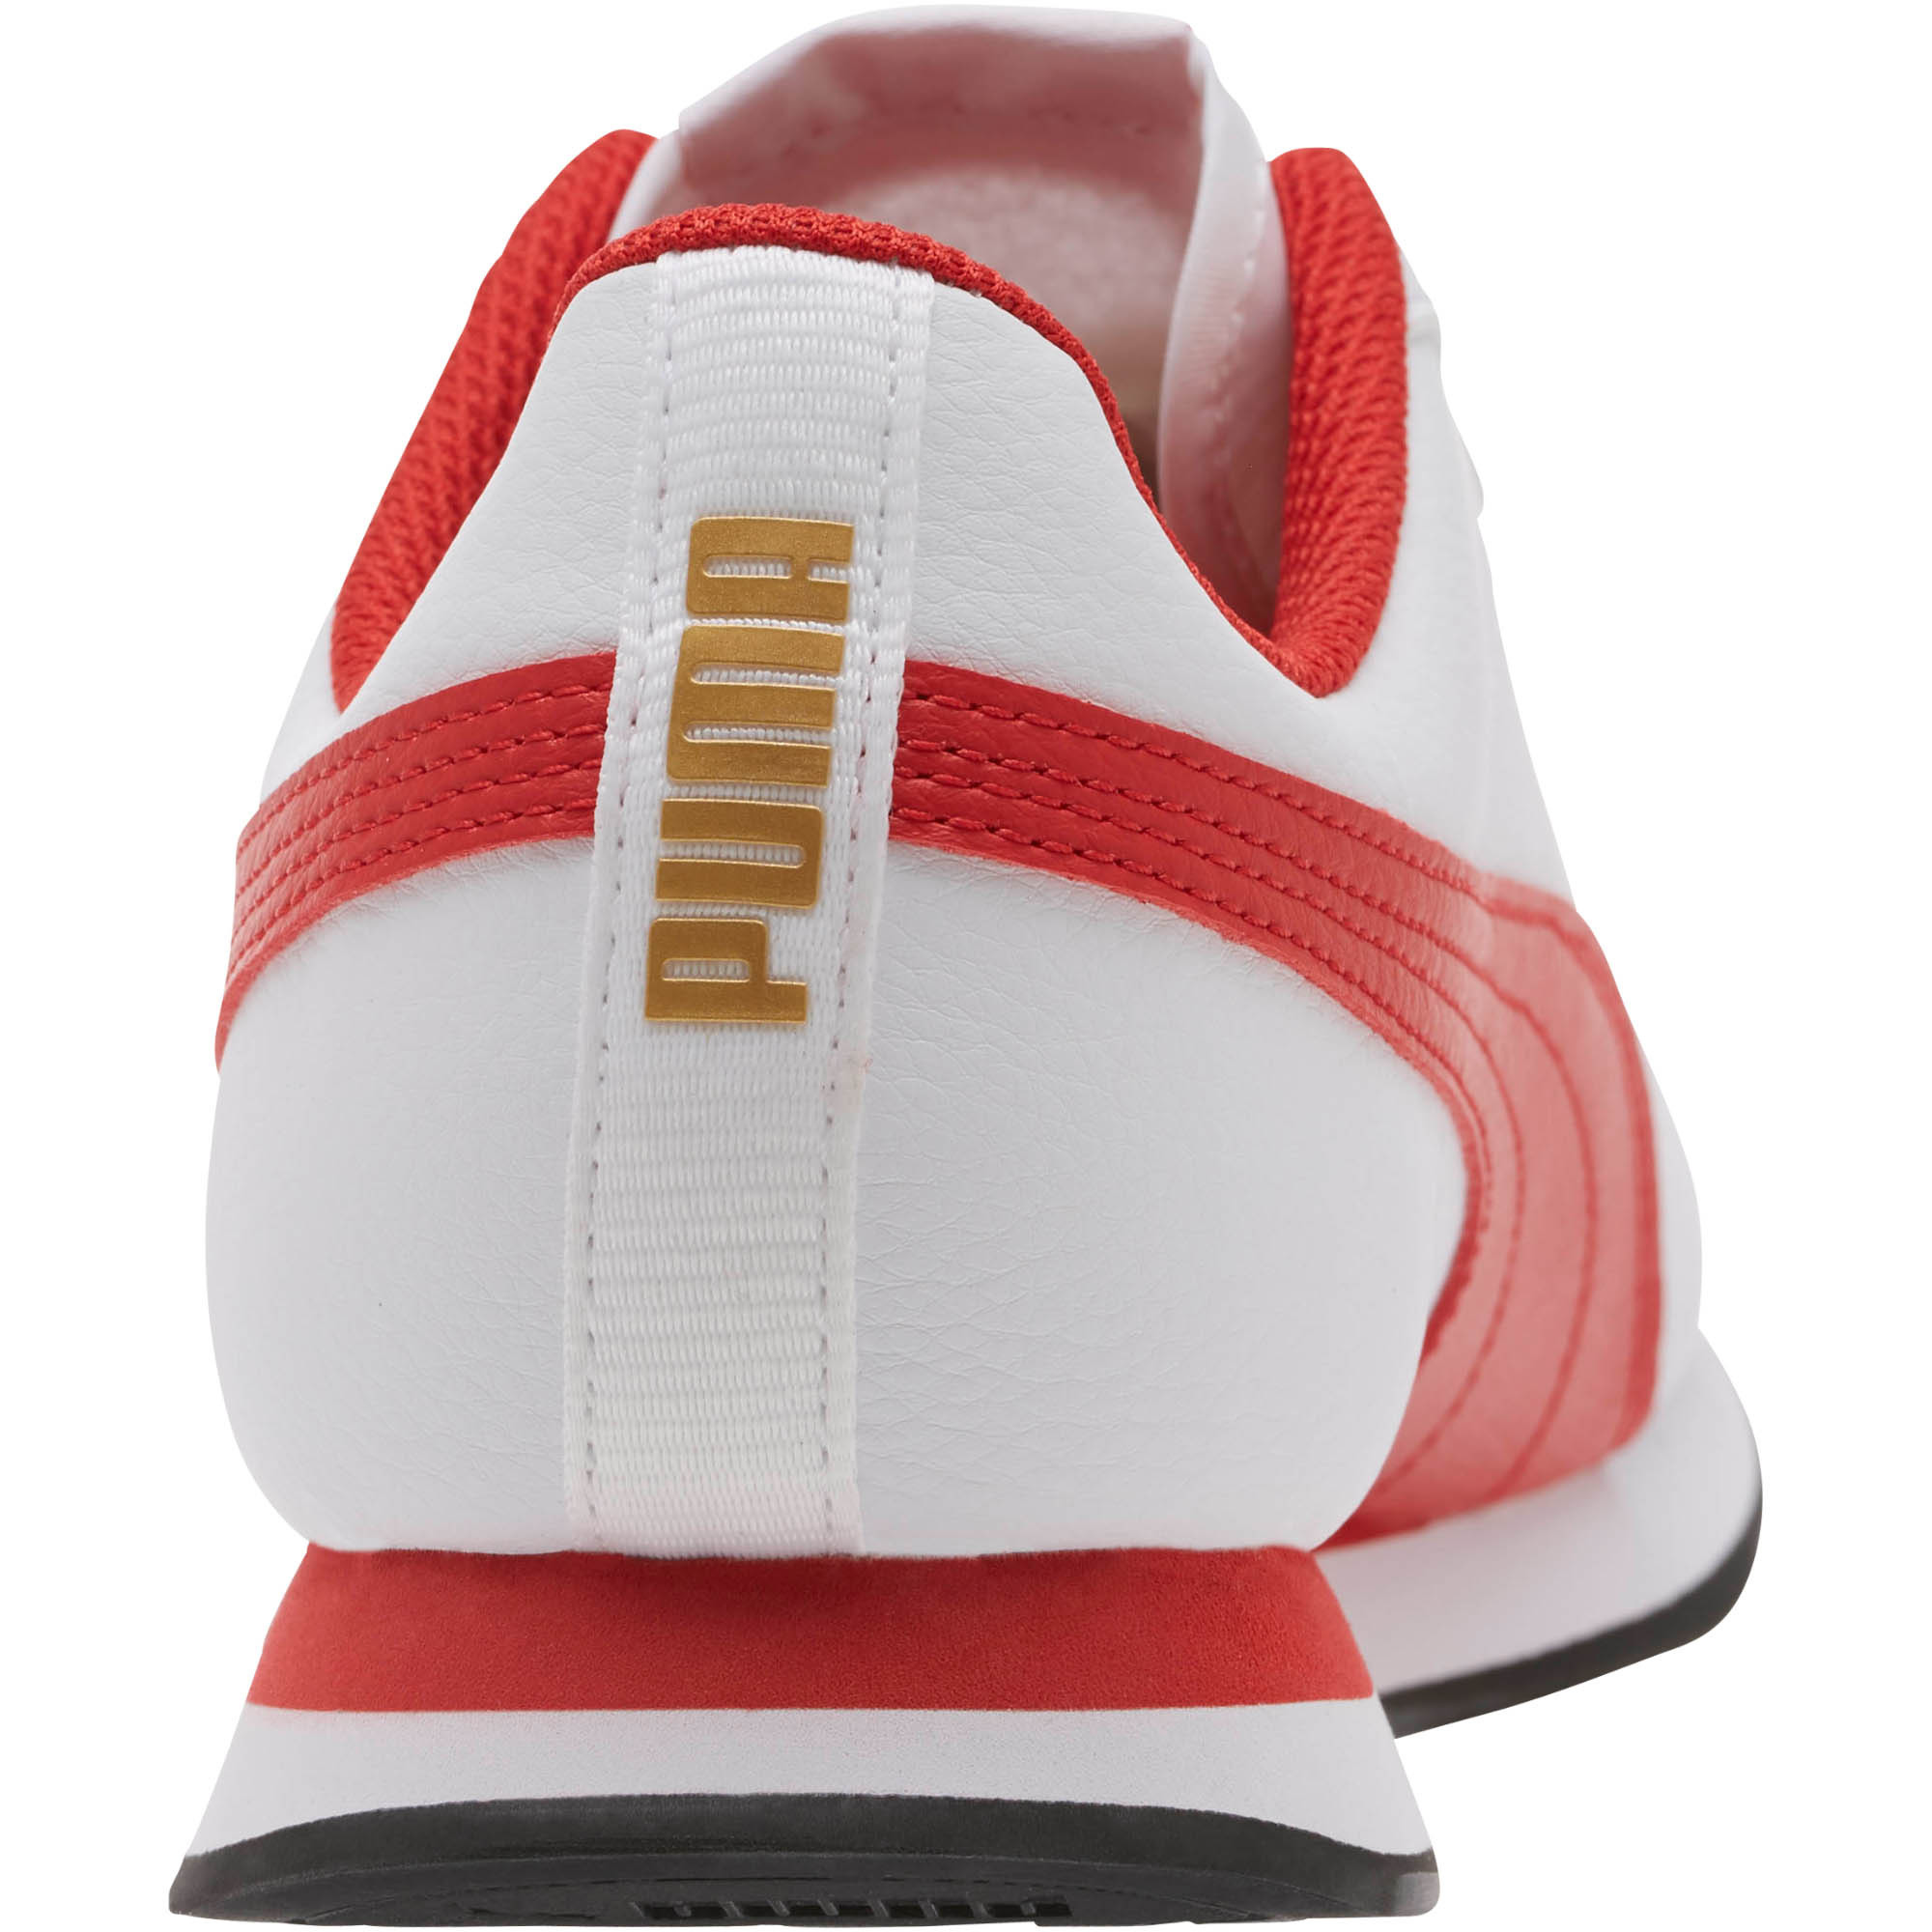 PUMA-Men-039-s-Turin-II-Sneakers thumbnail 31